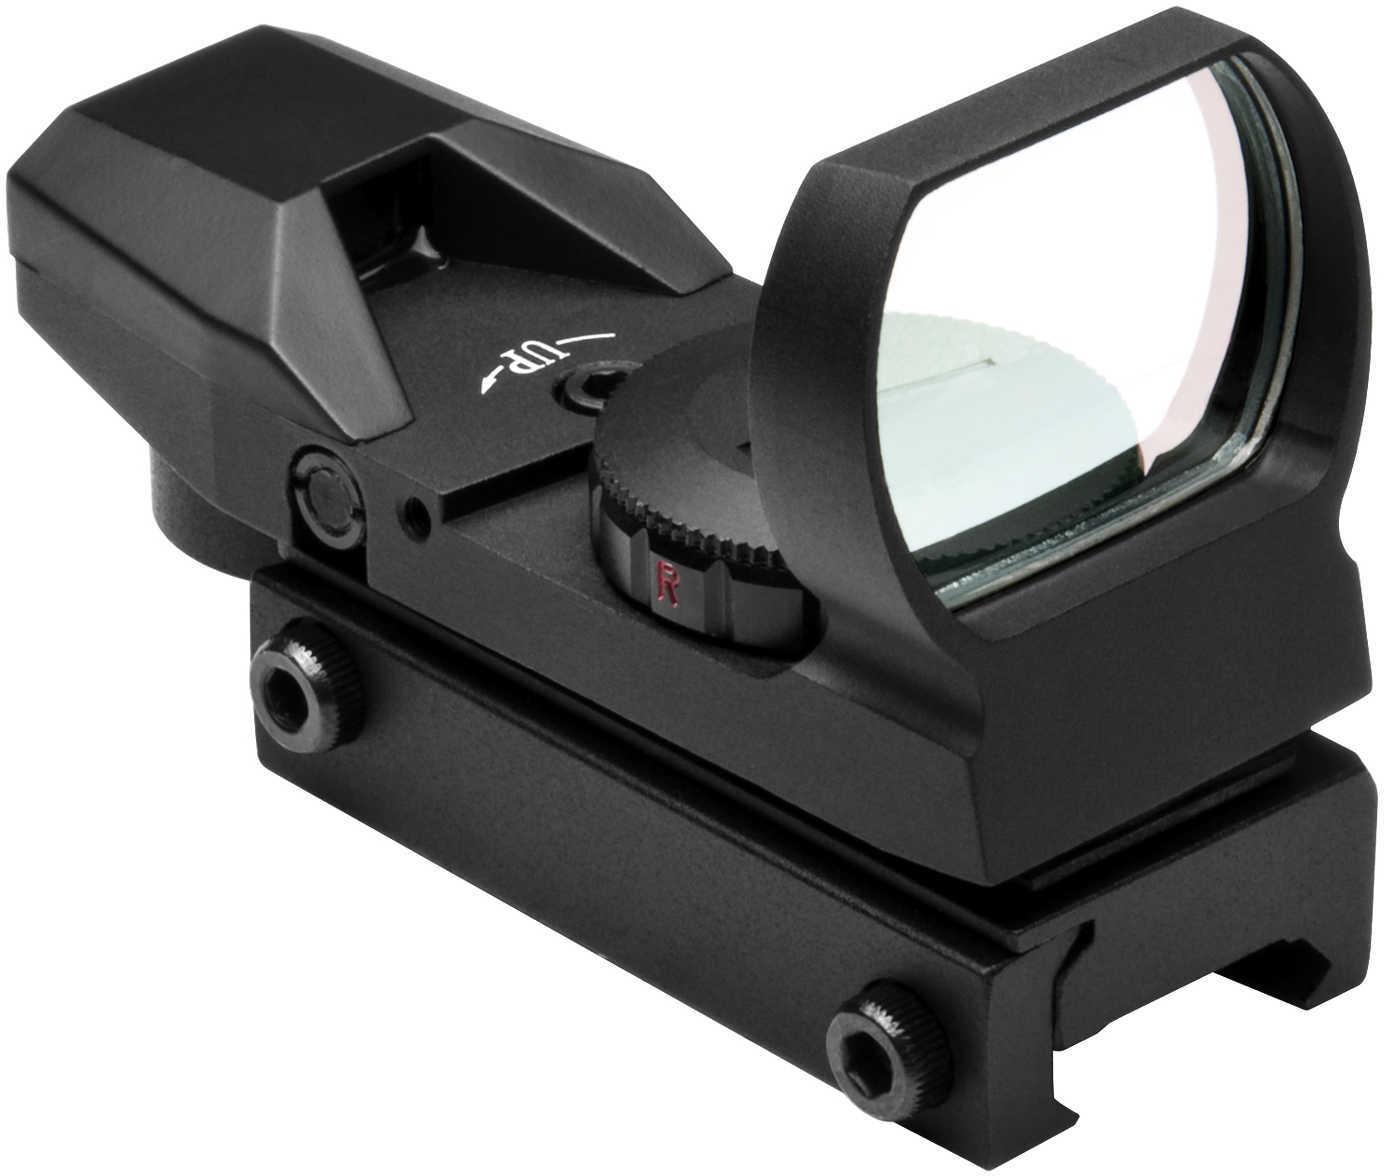 NCStar D4RGB Reflex Optic 1x 24x34mm 3 MOA Illuminated 4 Pattern Red/Green CR2032 Lithium Black Anodized